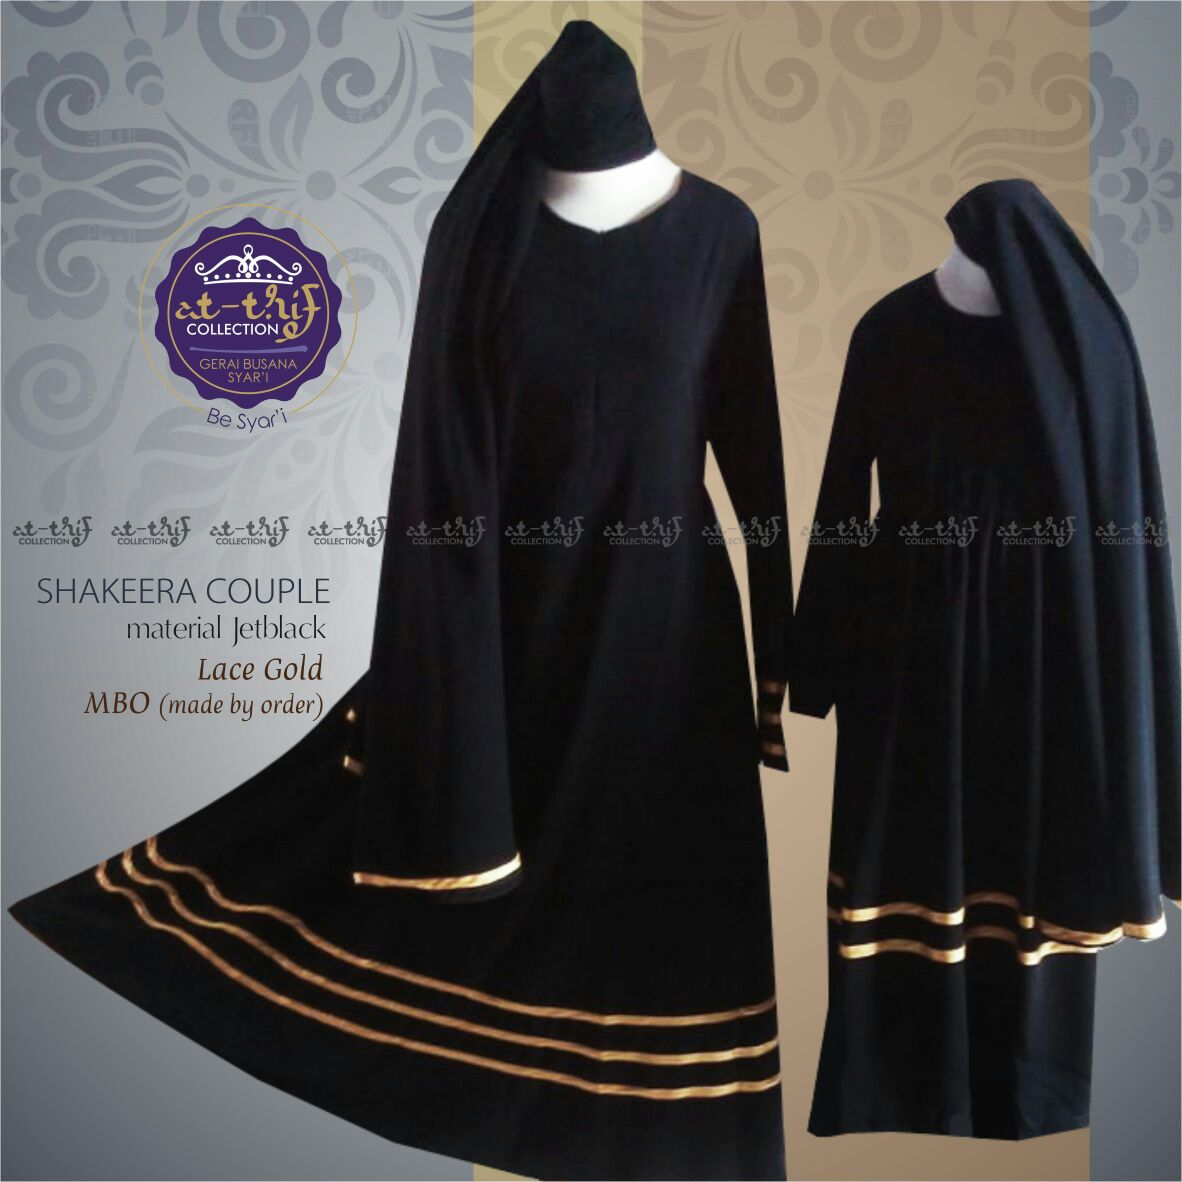 At Thif Collection Produsen Gamis Bekasi